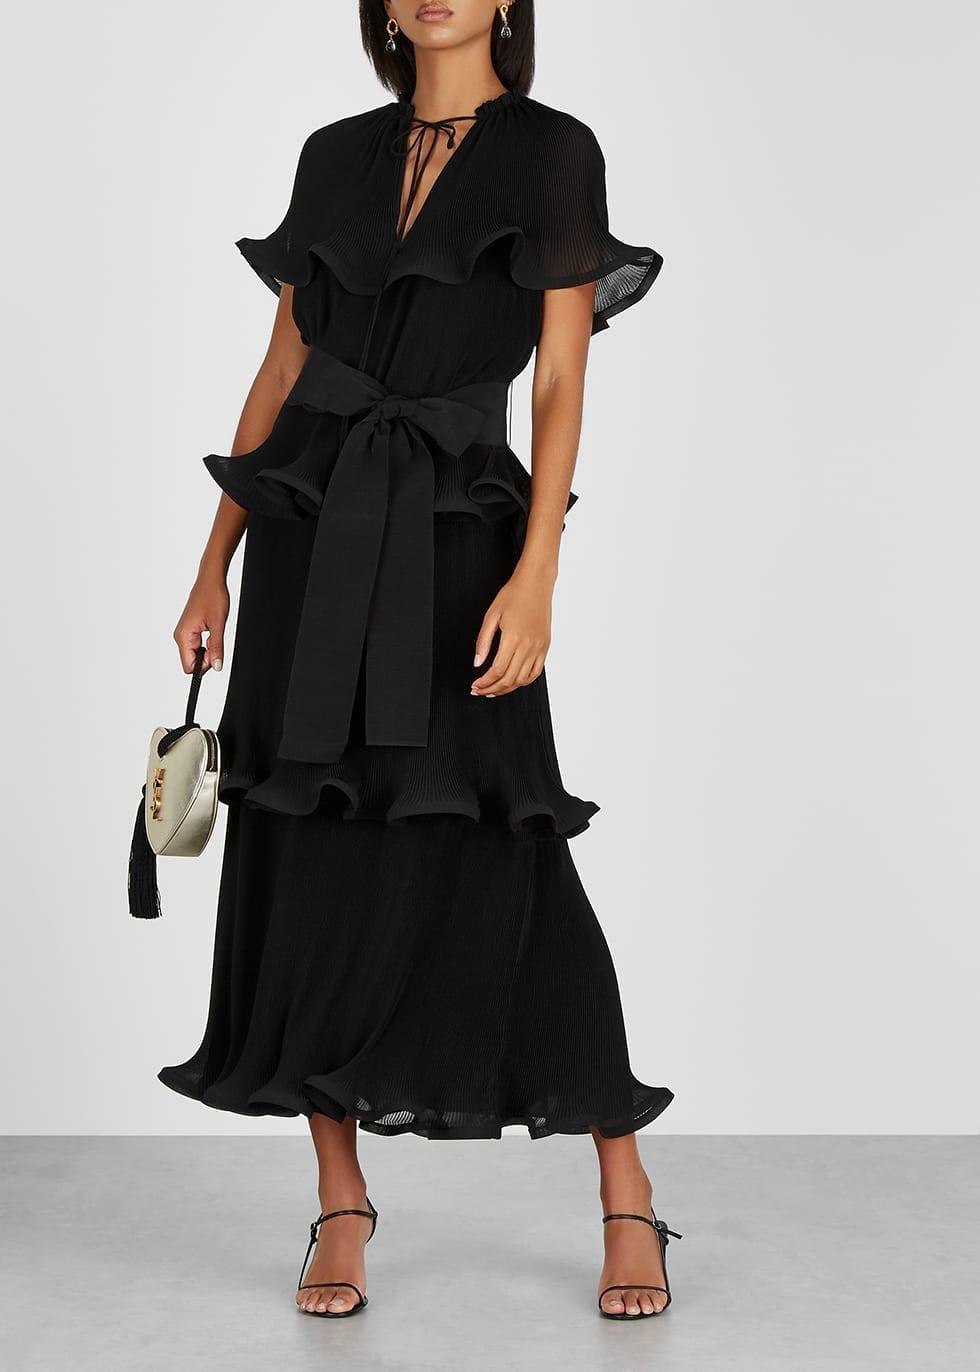 STELLA MCCARTNEY Black Tiered Plissé Maxi Dress